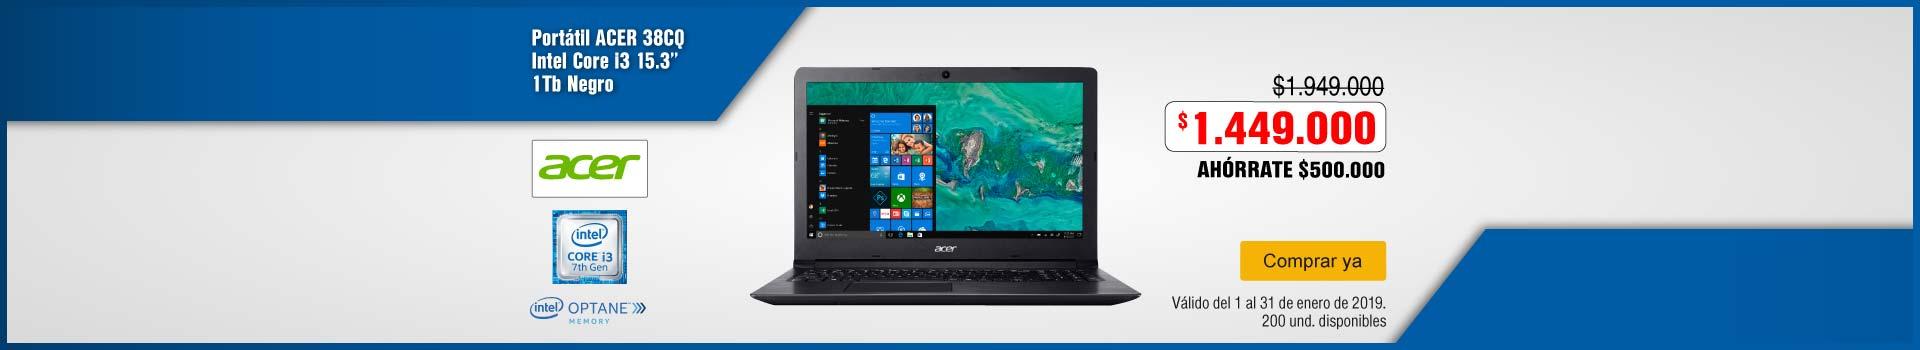 AK-KT-BCAT-1-computadores y tablets-PP---Acer-Portátil 38CQ-ene19